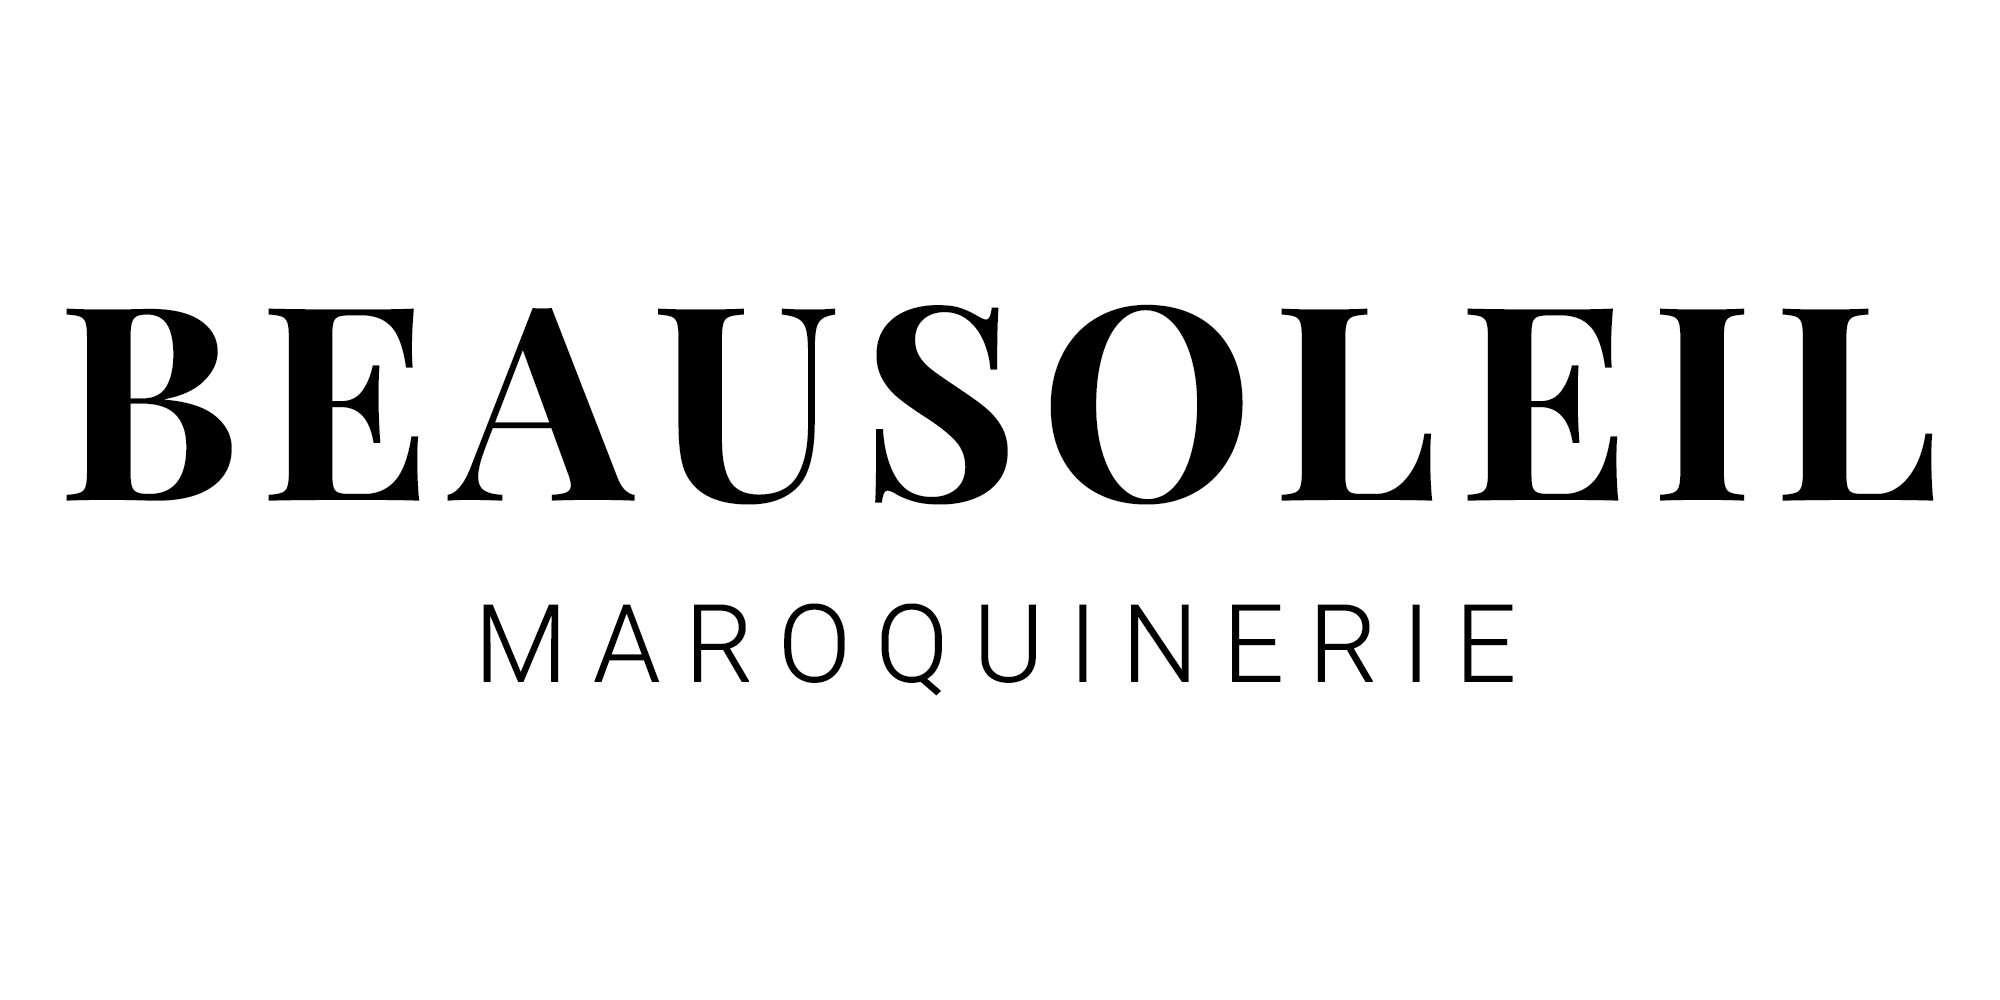 Beausoleil Maroquinerie centre commercial et grand magasin